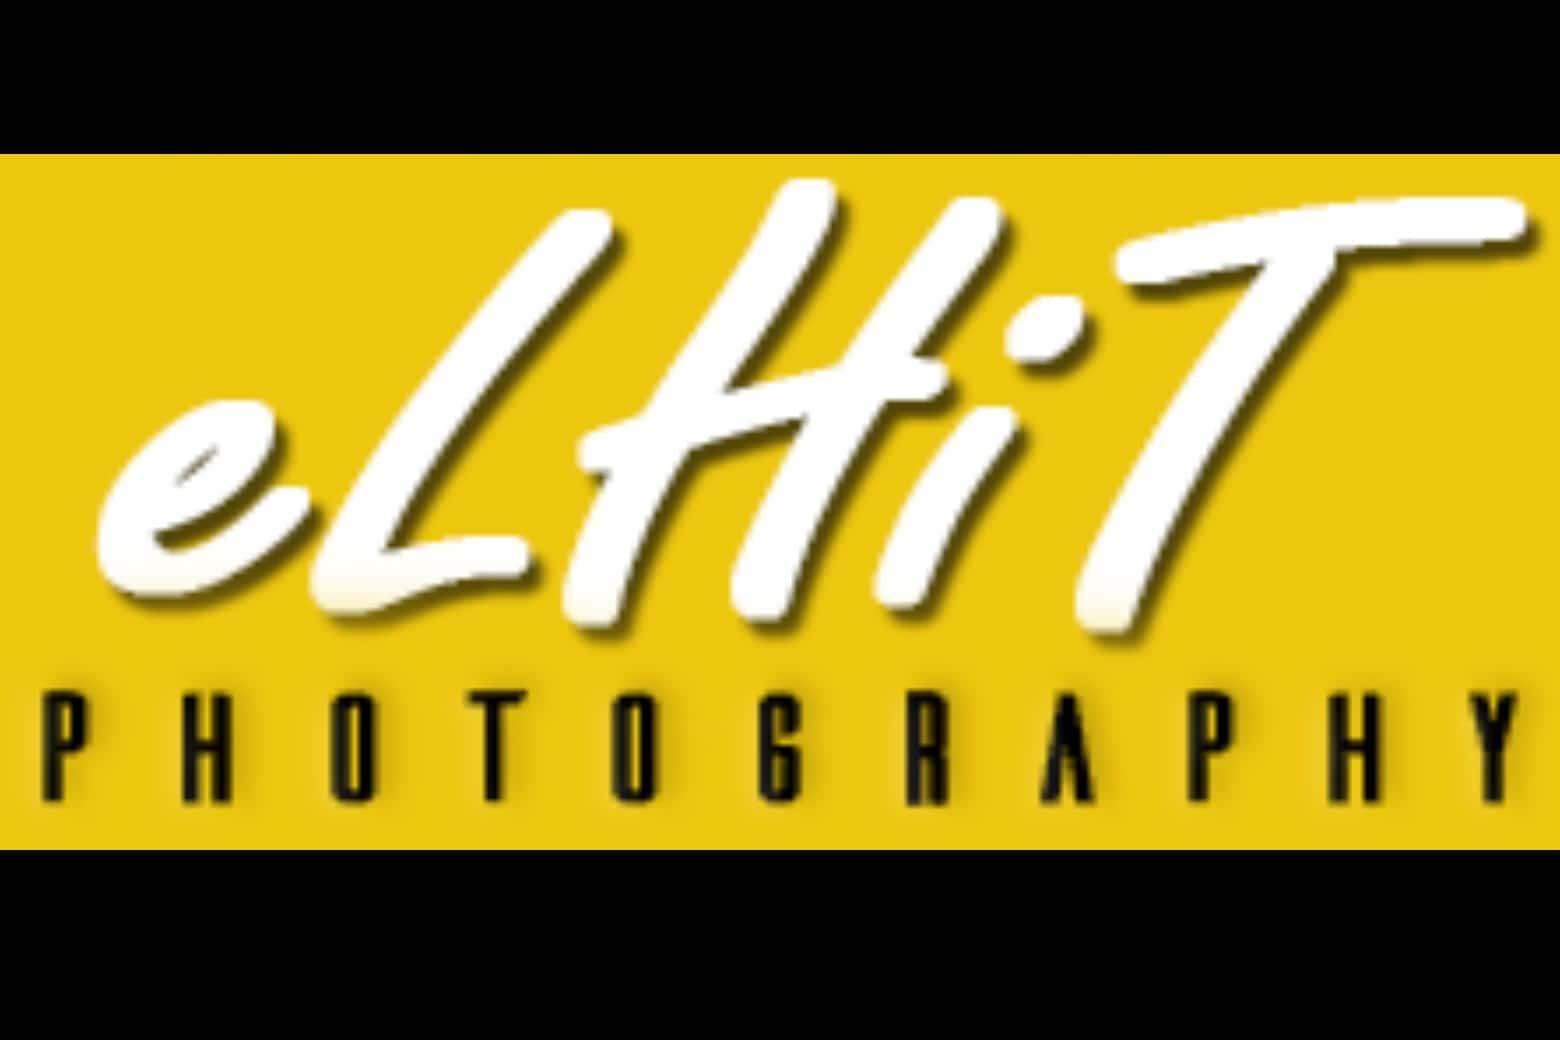 eLHiT Photography Logo